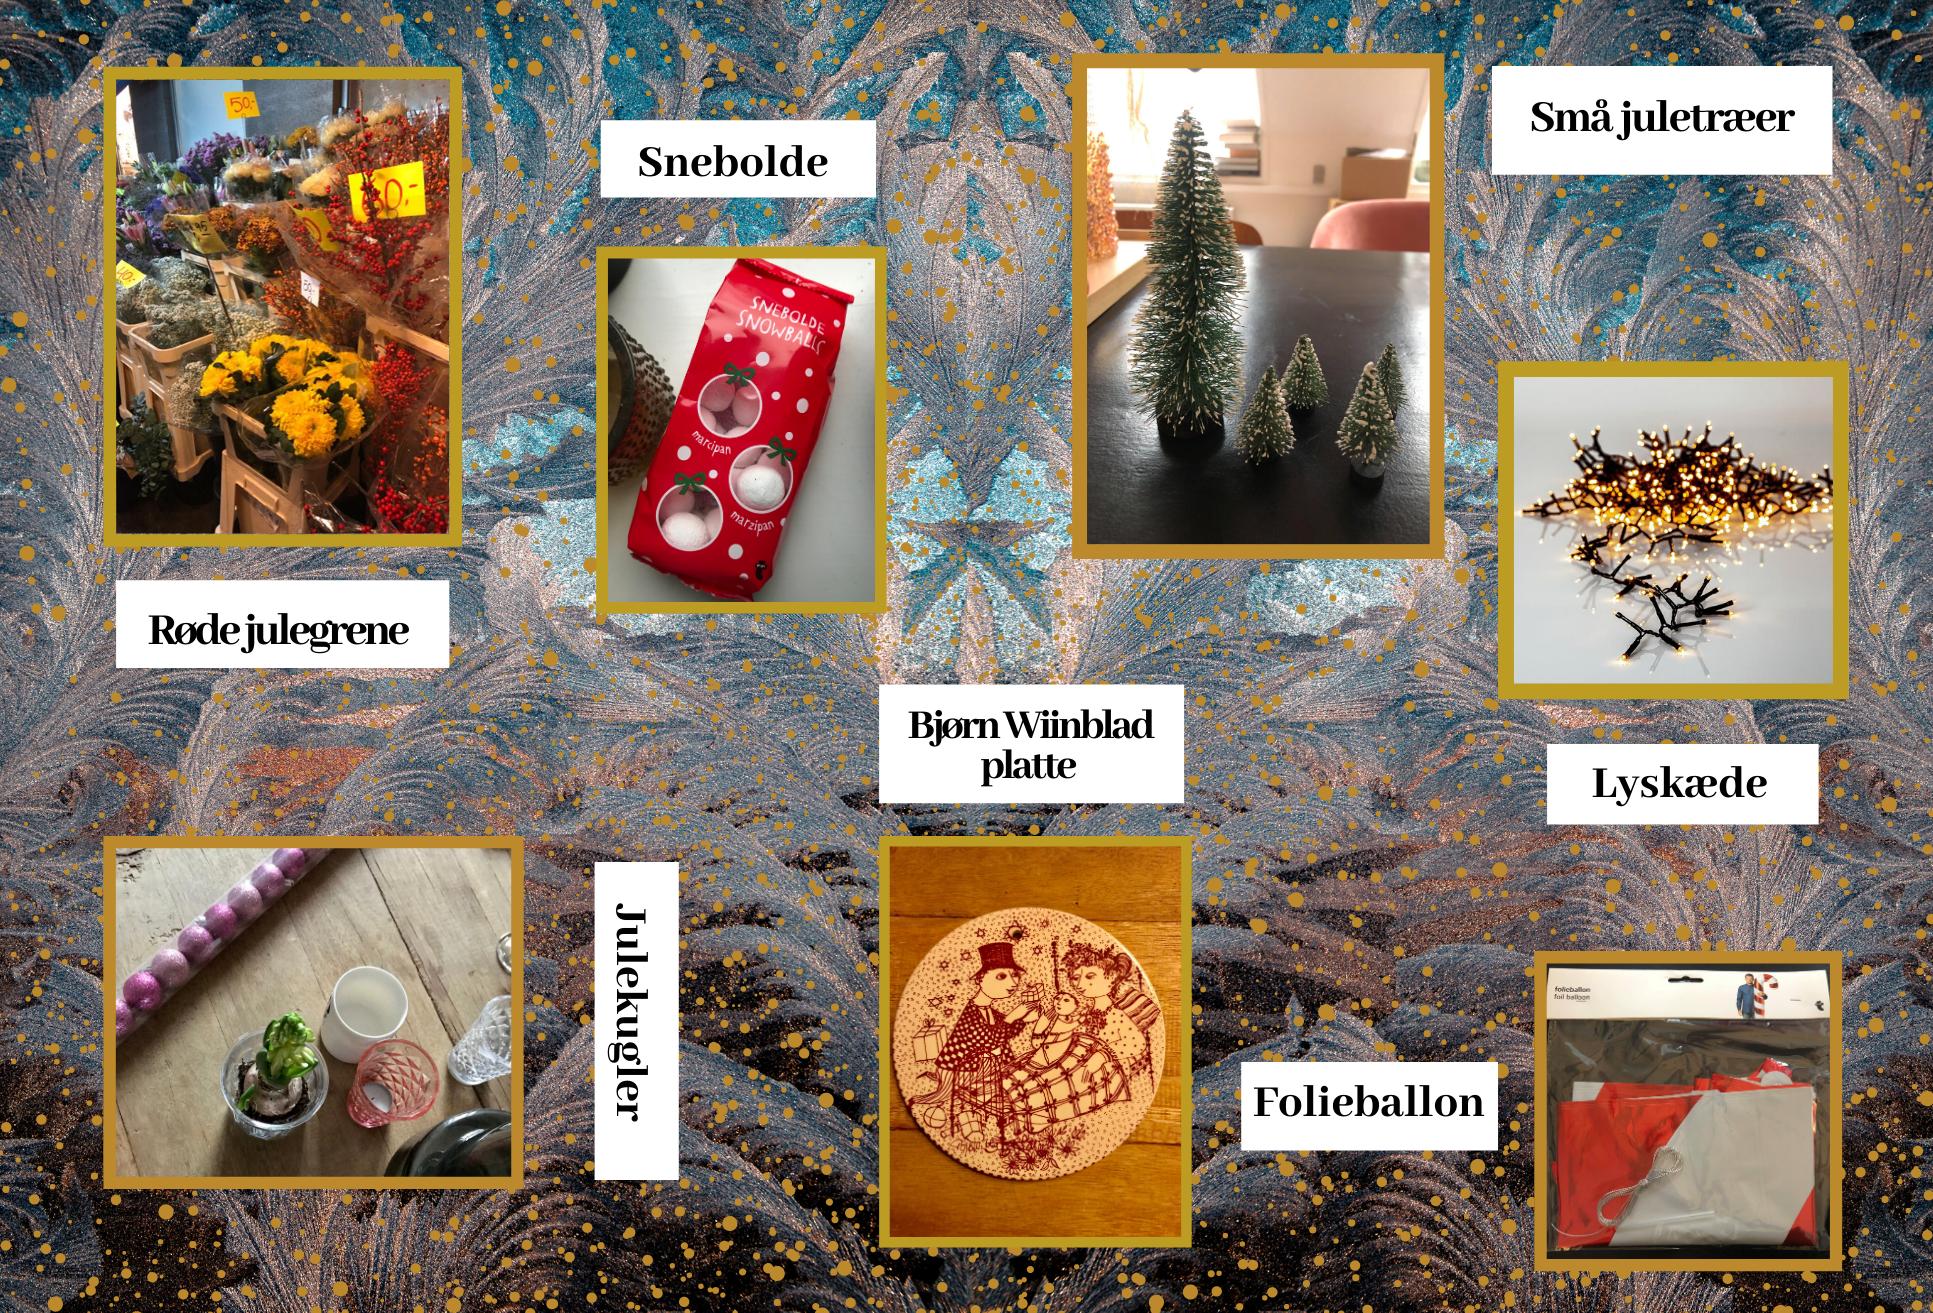 DIY, julegrene, snebolde, juletræer, lyskæde, folieballon, platte, julekugler, jul, pynt (Foto: MY DAILY SPACE)